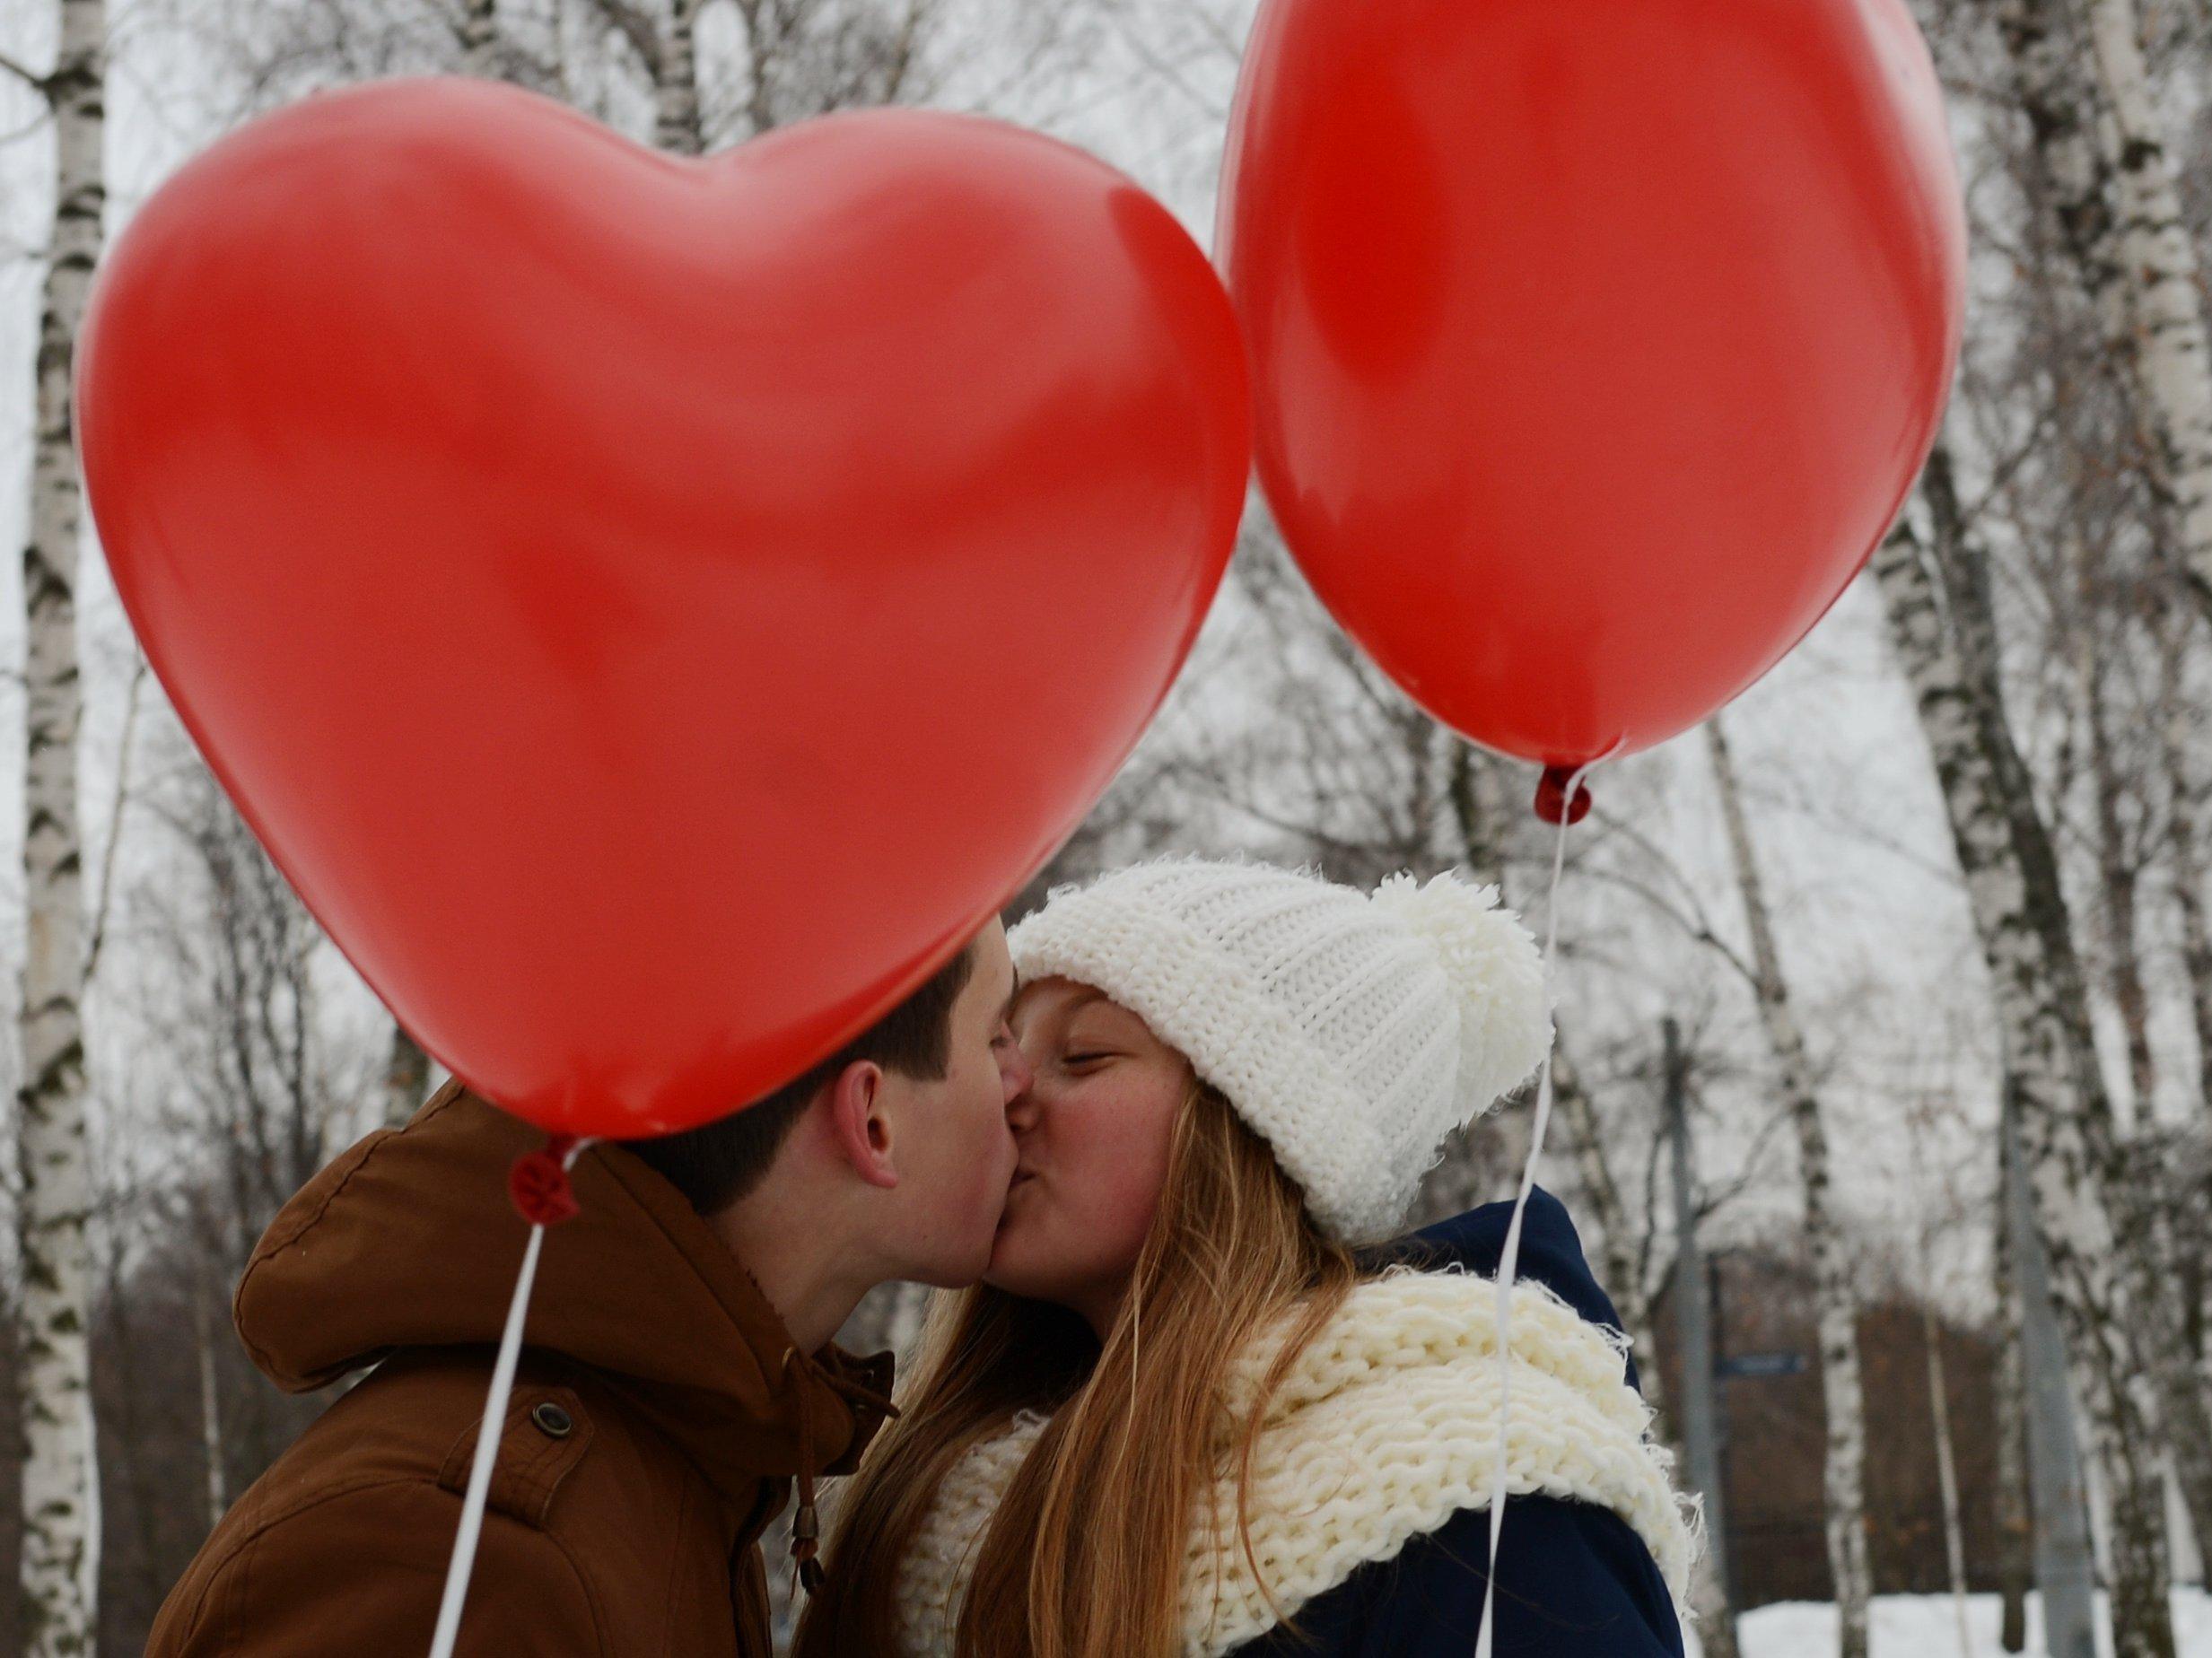 Празднование Дня святого Валентина